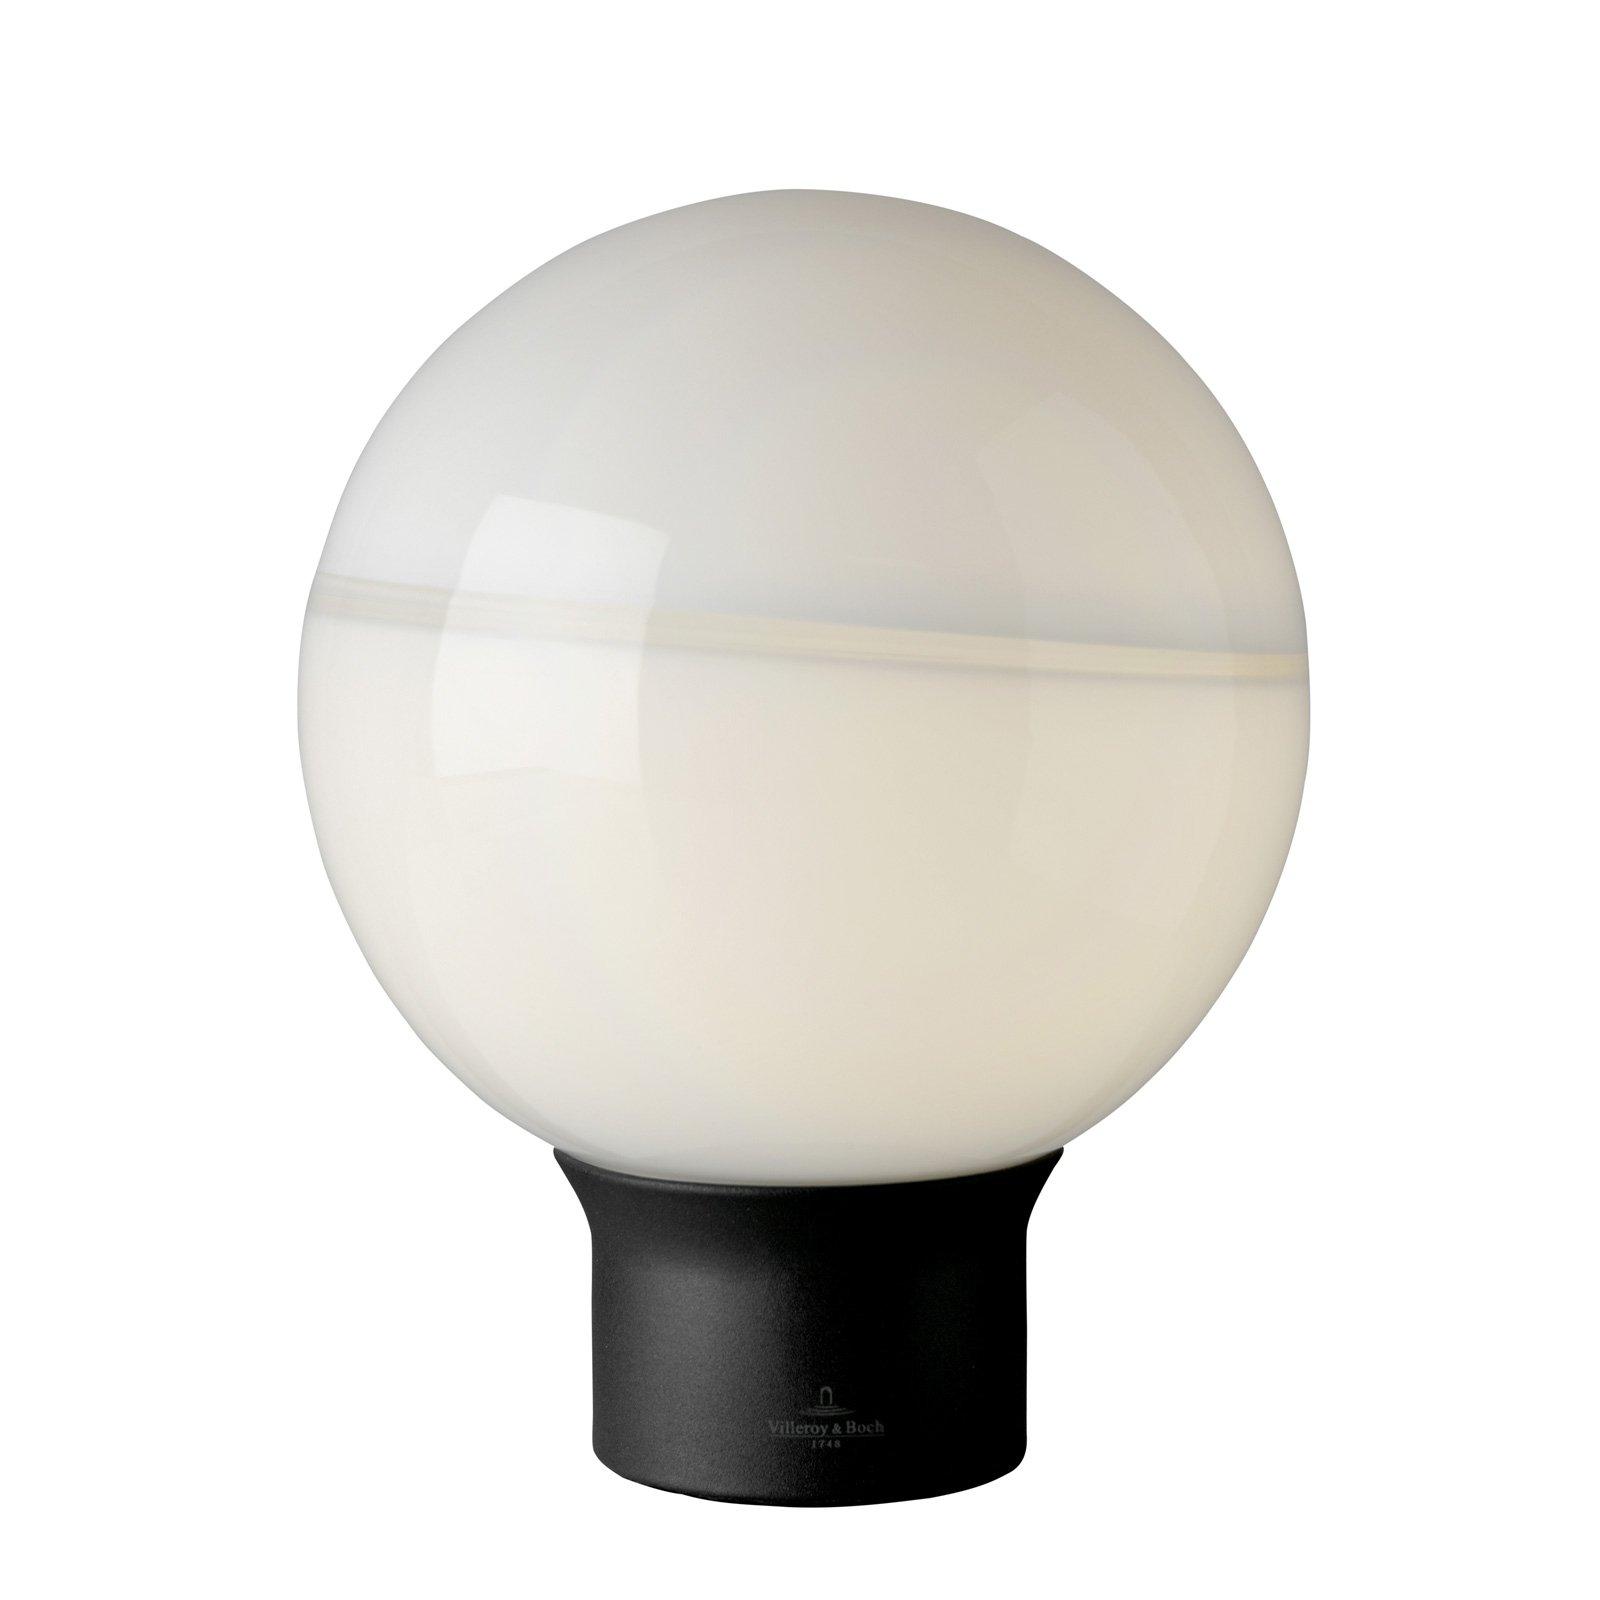 Villeroy & Boch Tokio bordlampe svart-hvit 20 cm